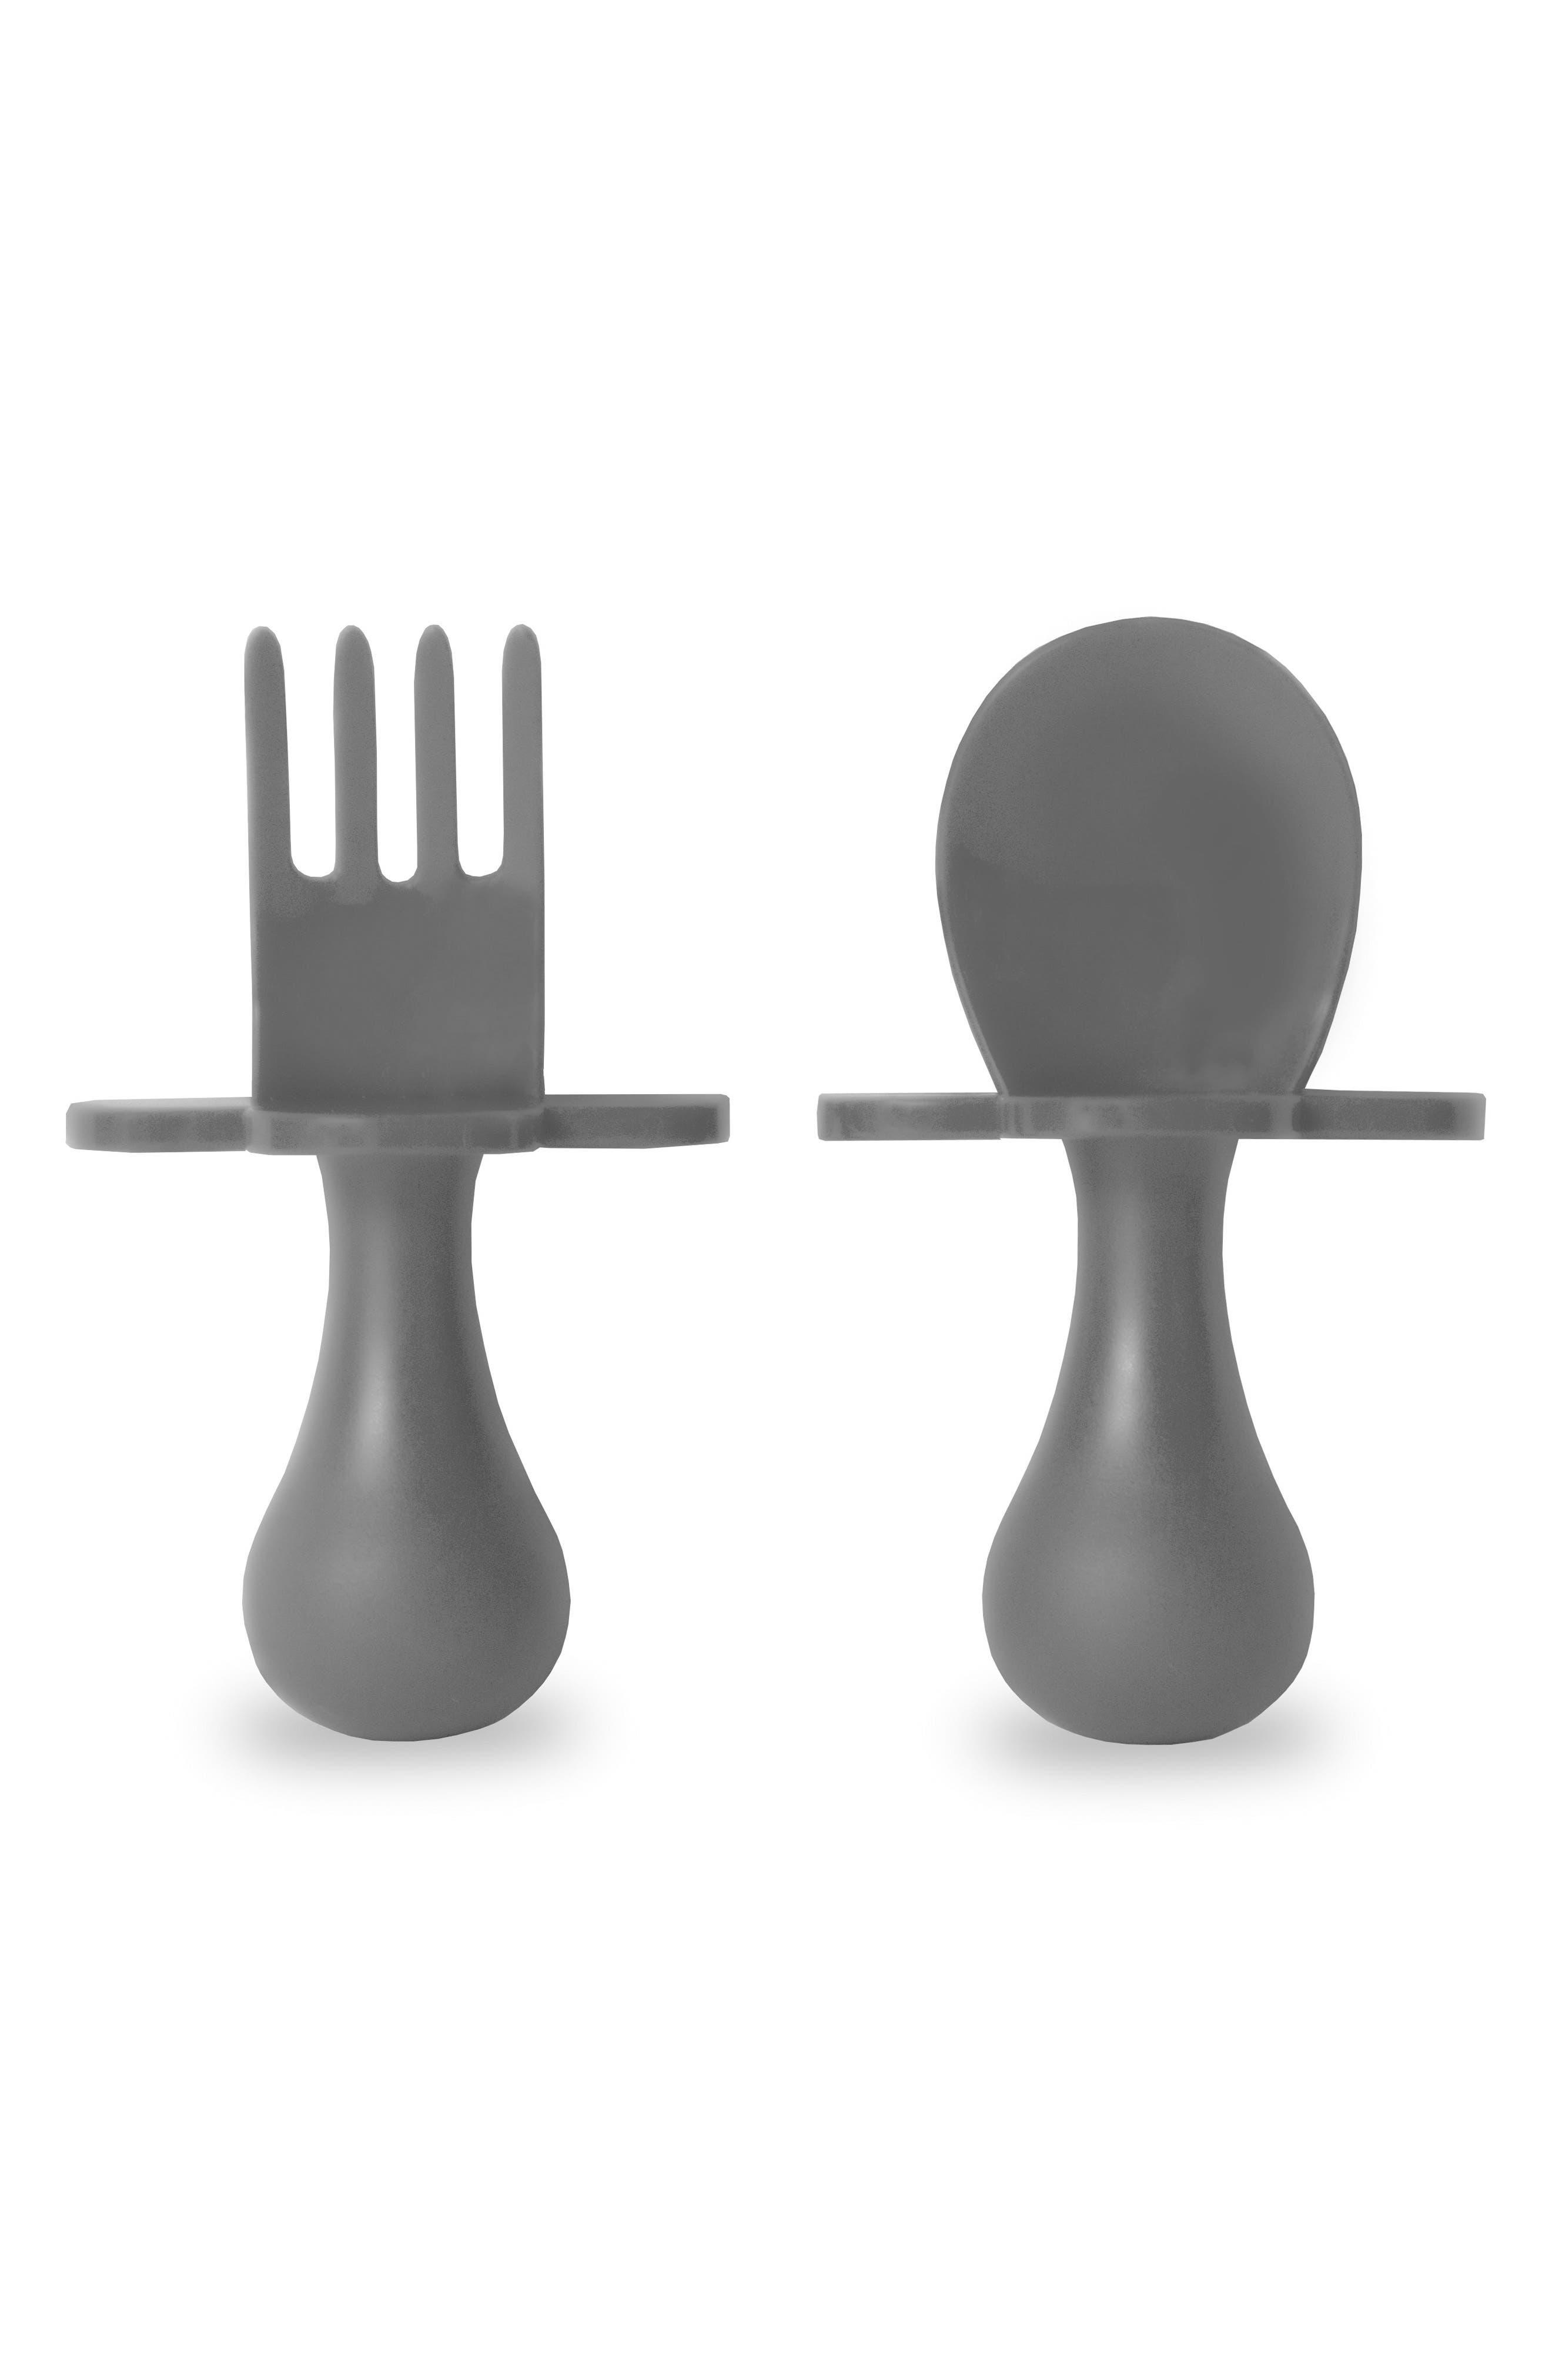 Self Feeding Fork & Spoon Set,                             Main thumbnail 1, color,                             Gray